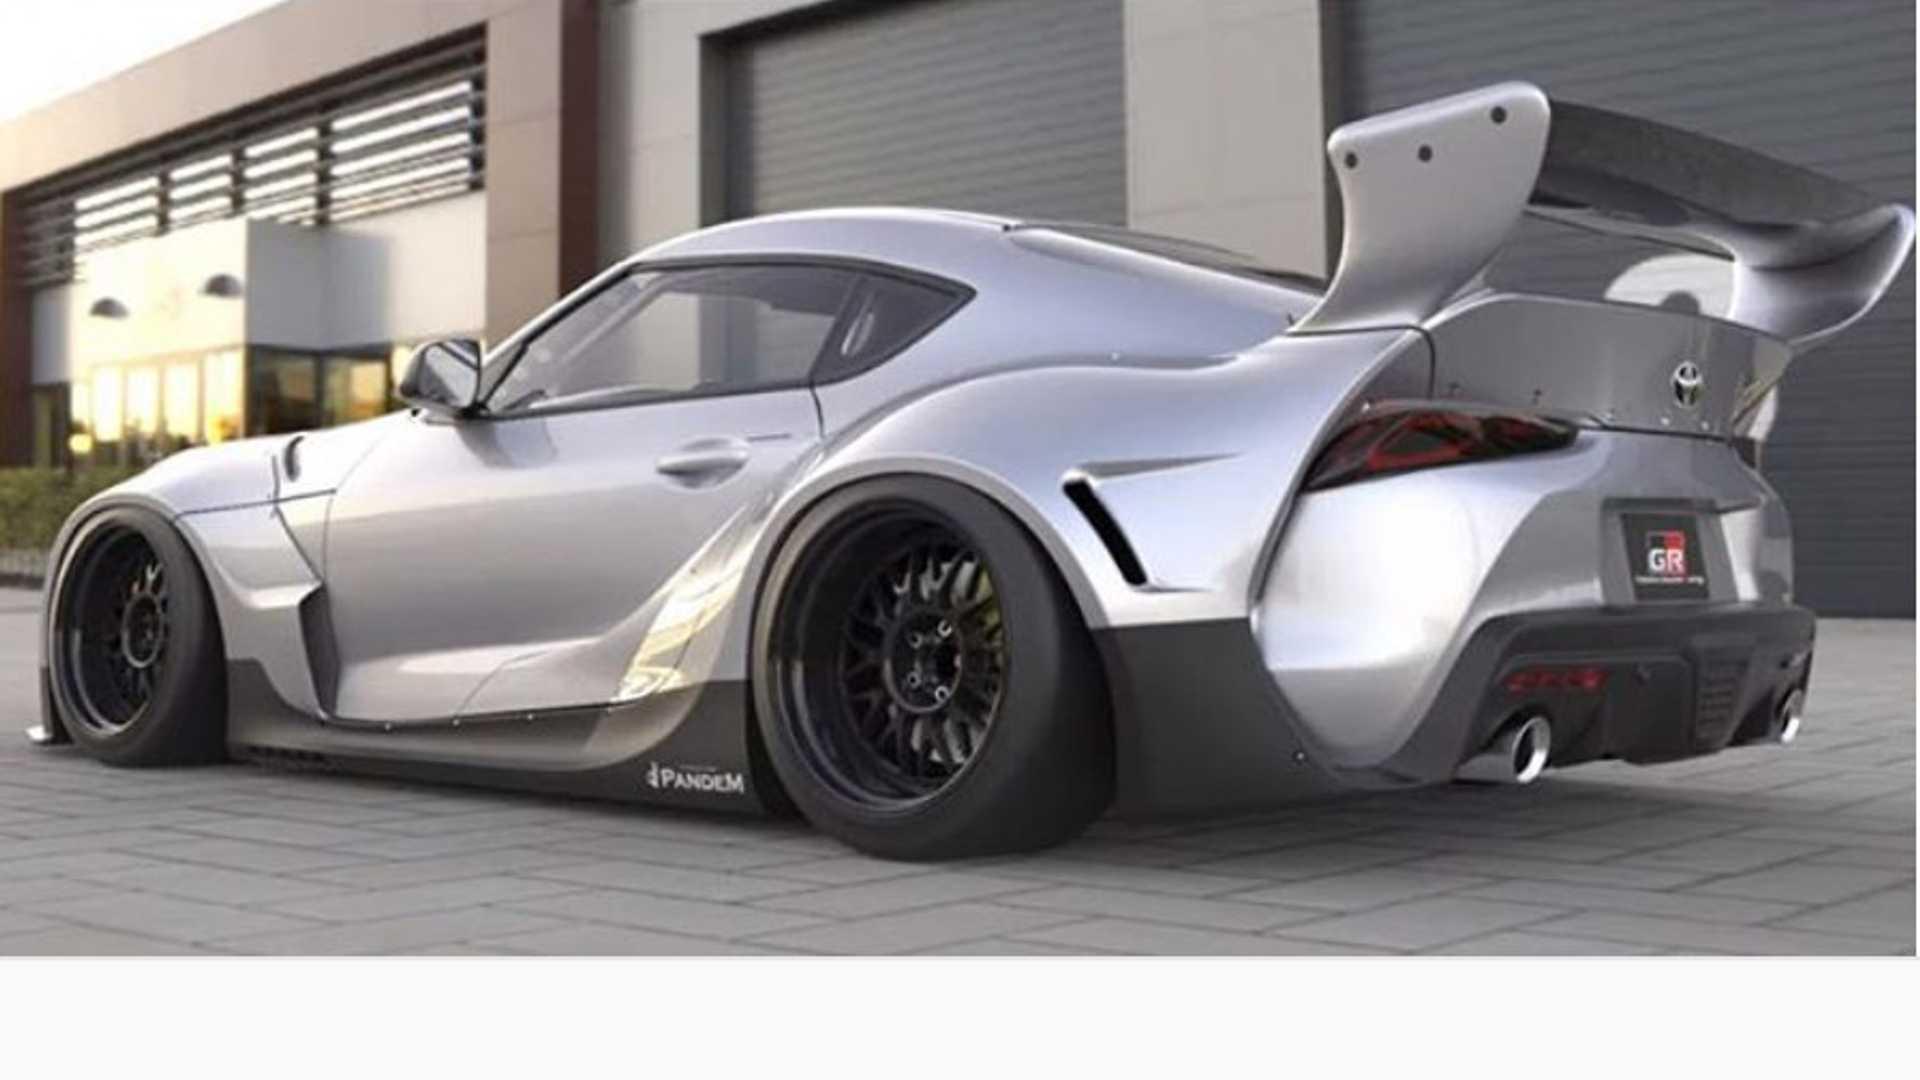 Pandem Designs Body Kit For 2020 Toyota Supra - Motor Illustrated